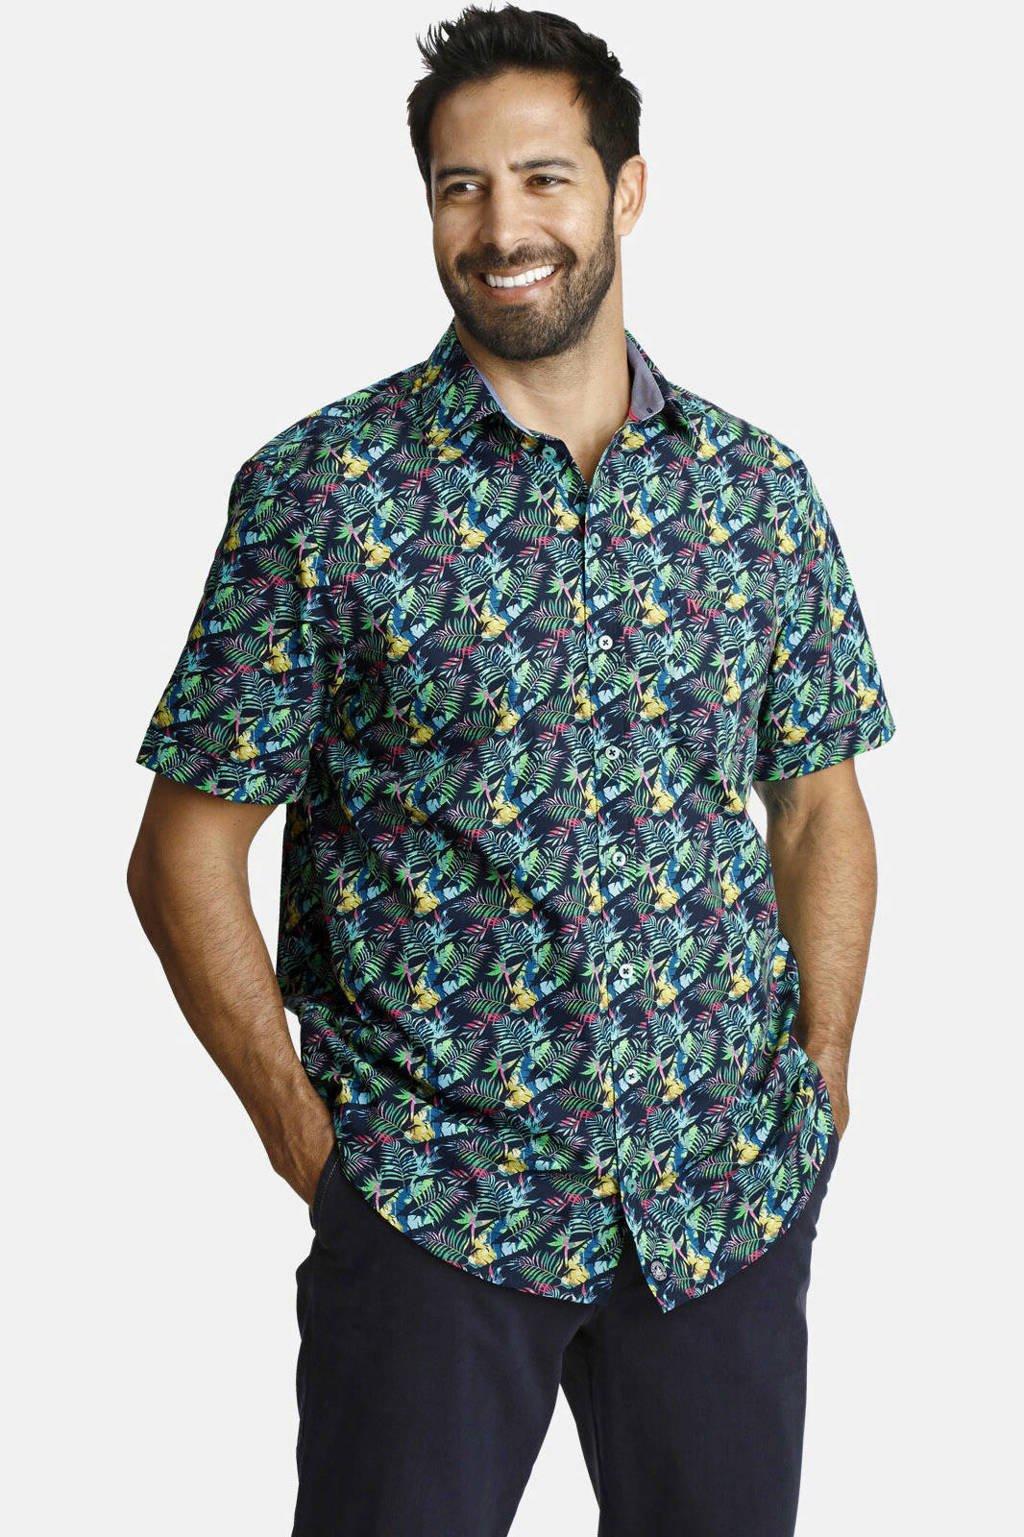 Jan Vanderstorm loose fit overhemd Plus Size Tycho met all over print donkerblauw/geel, Donkerblauw/geel